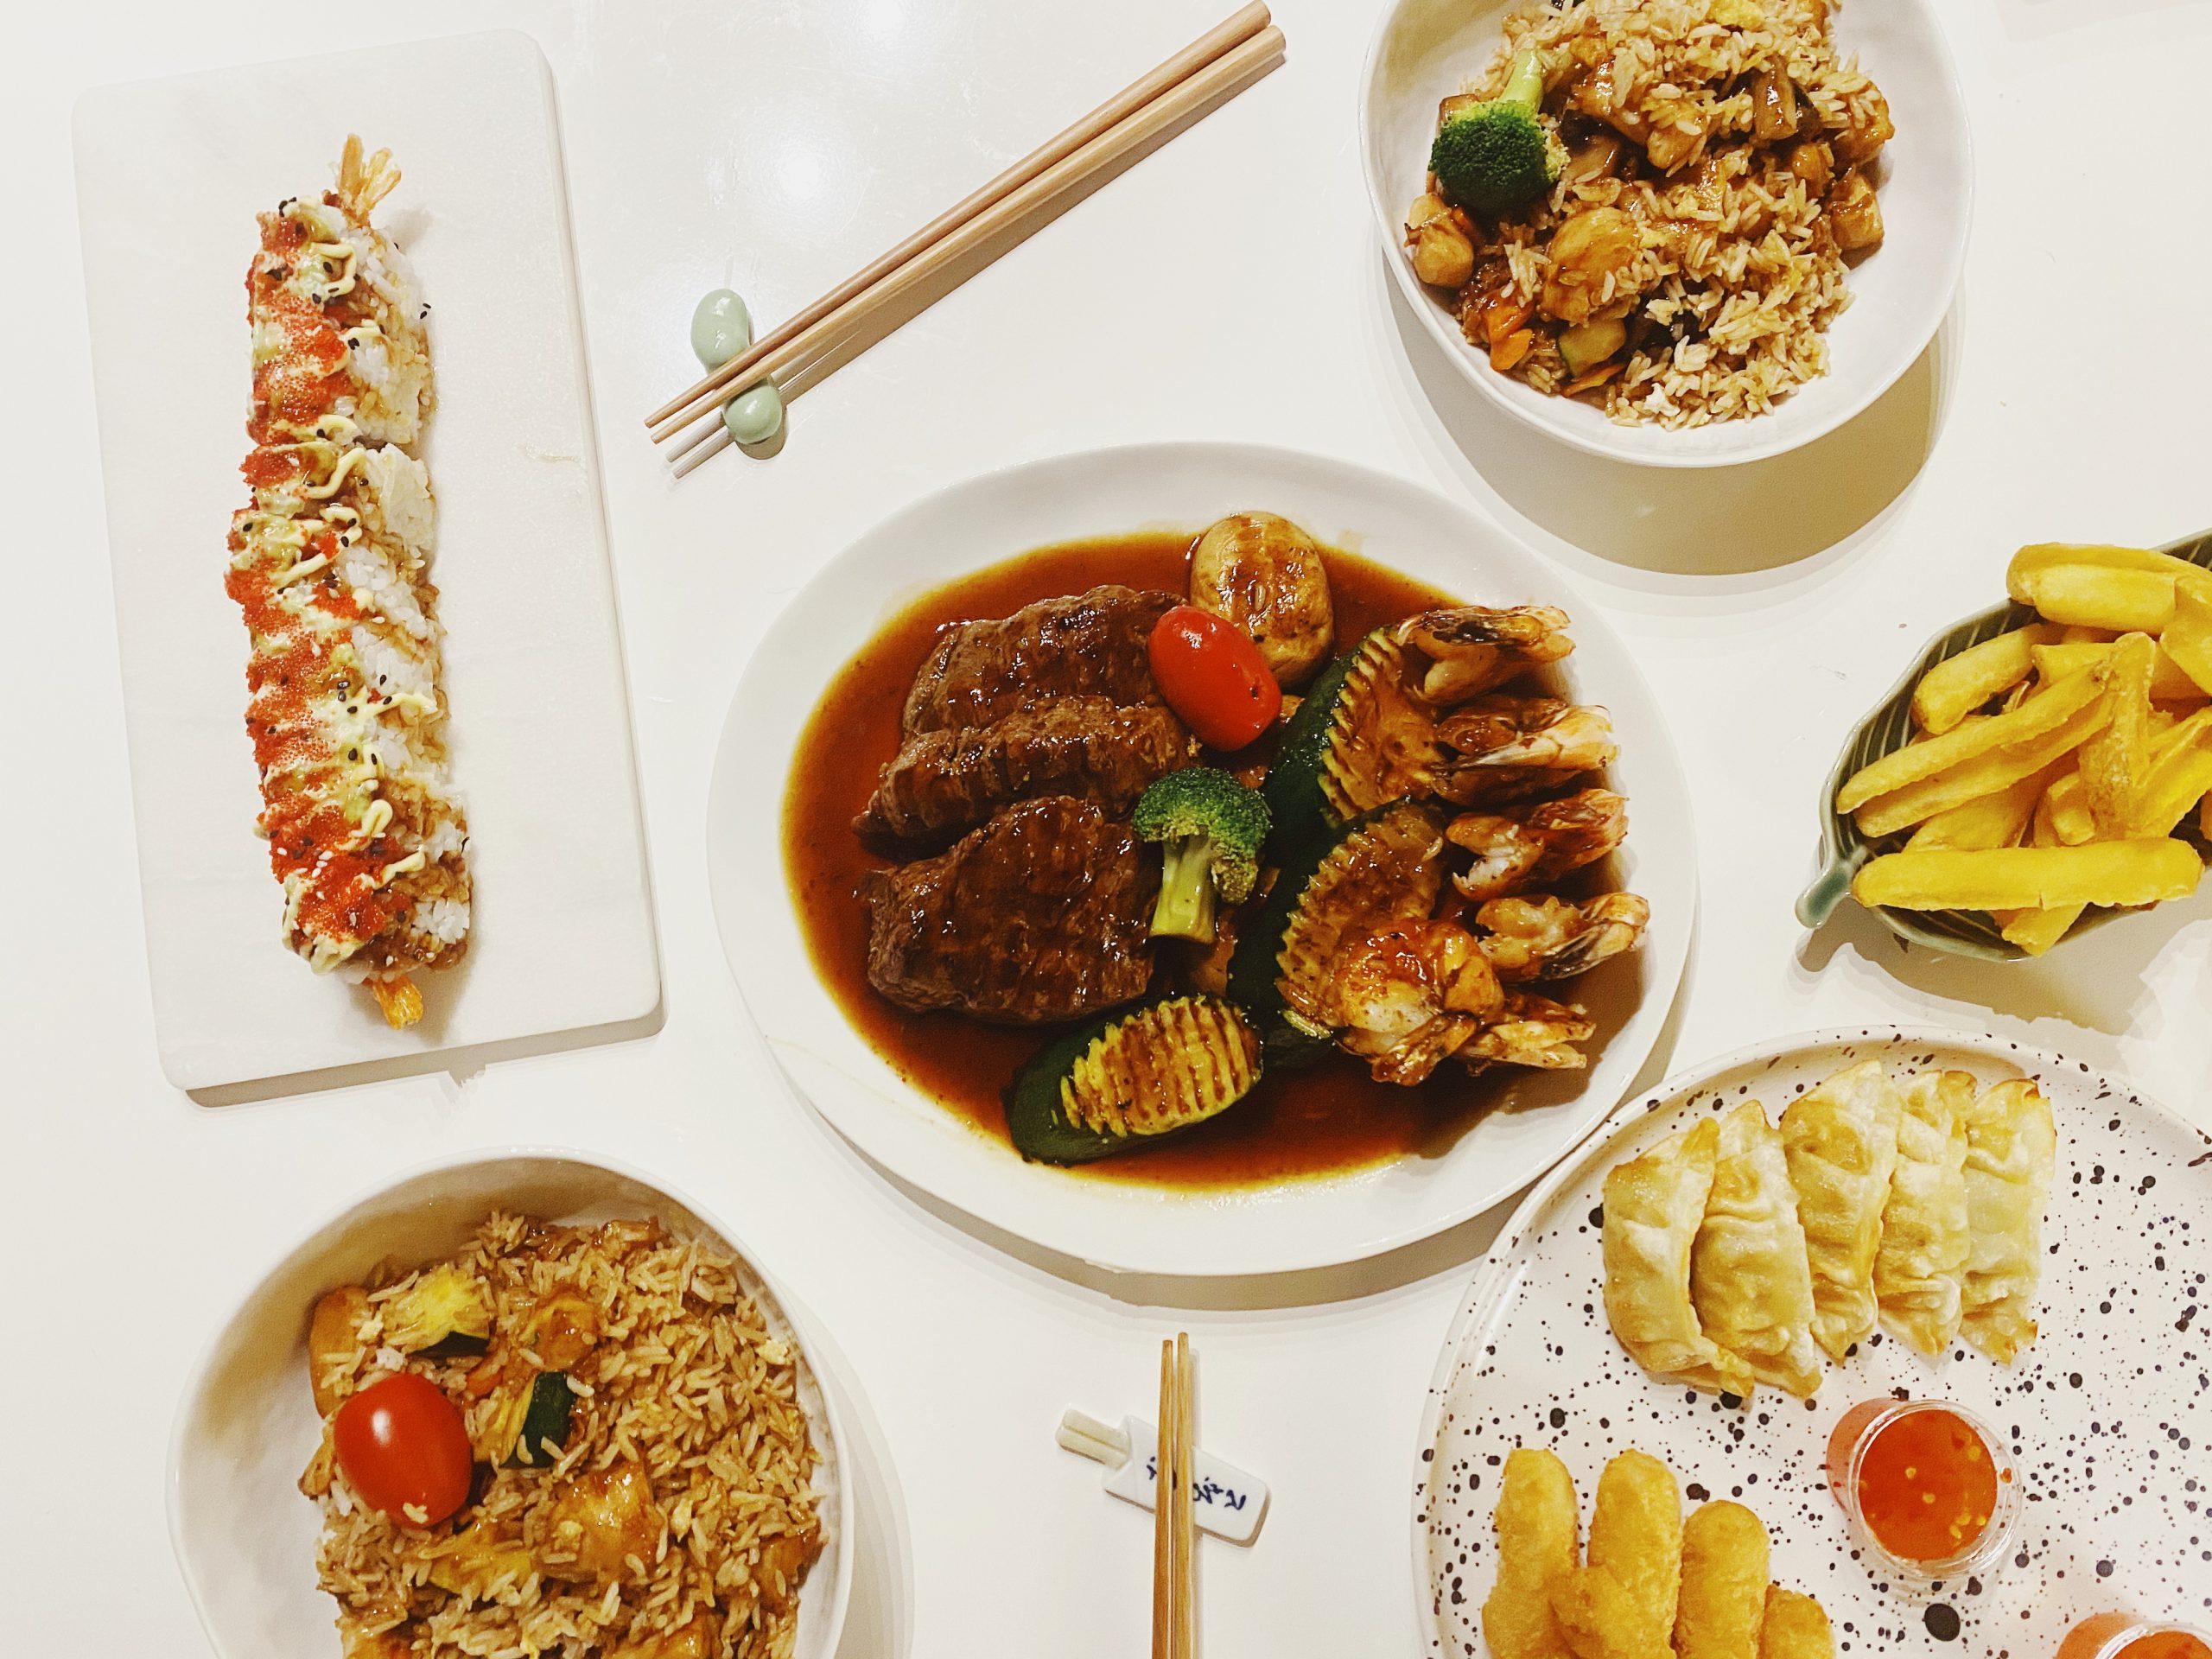 Omnomnom streetfood asiatique Liège - DR Boulettes Magazine